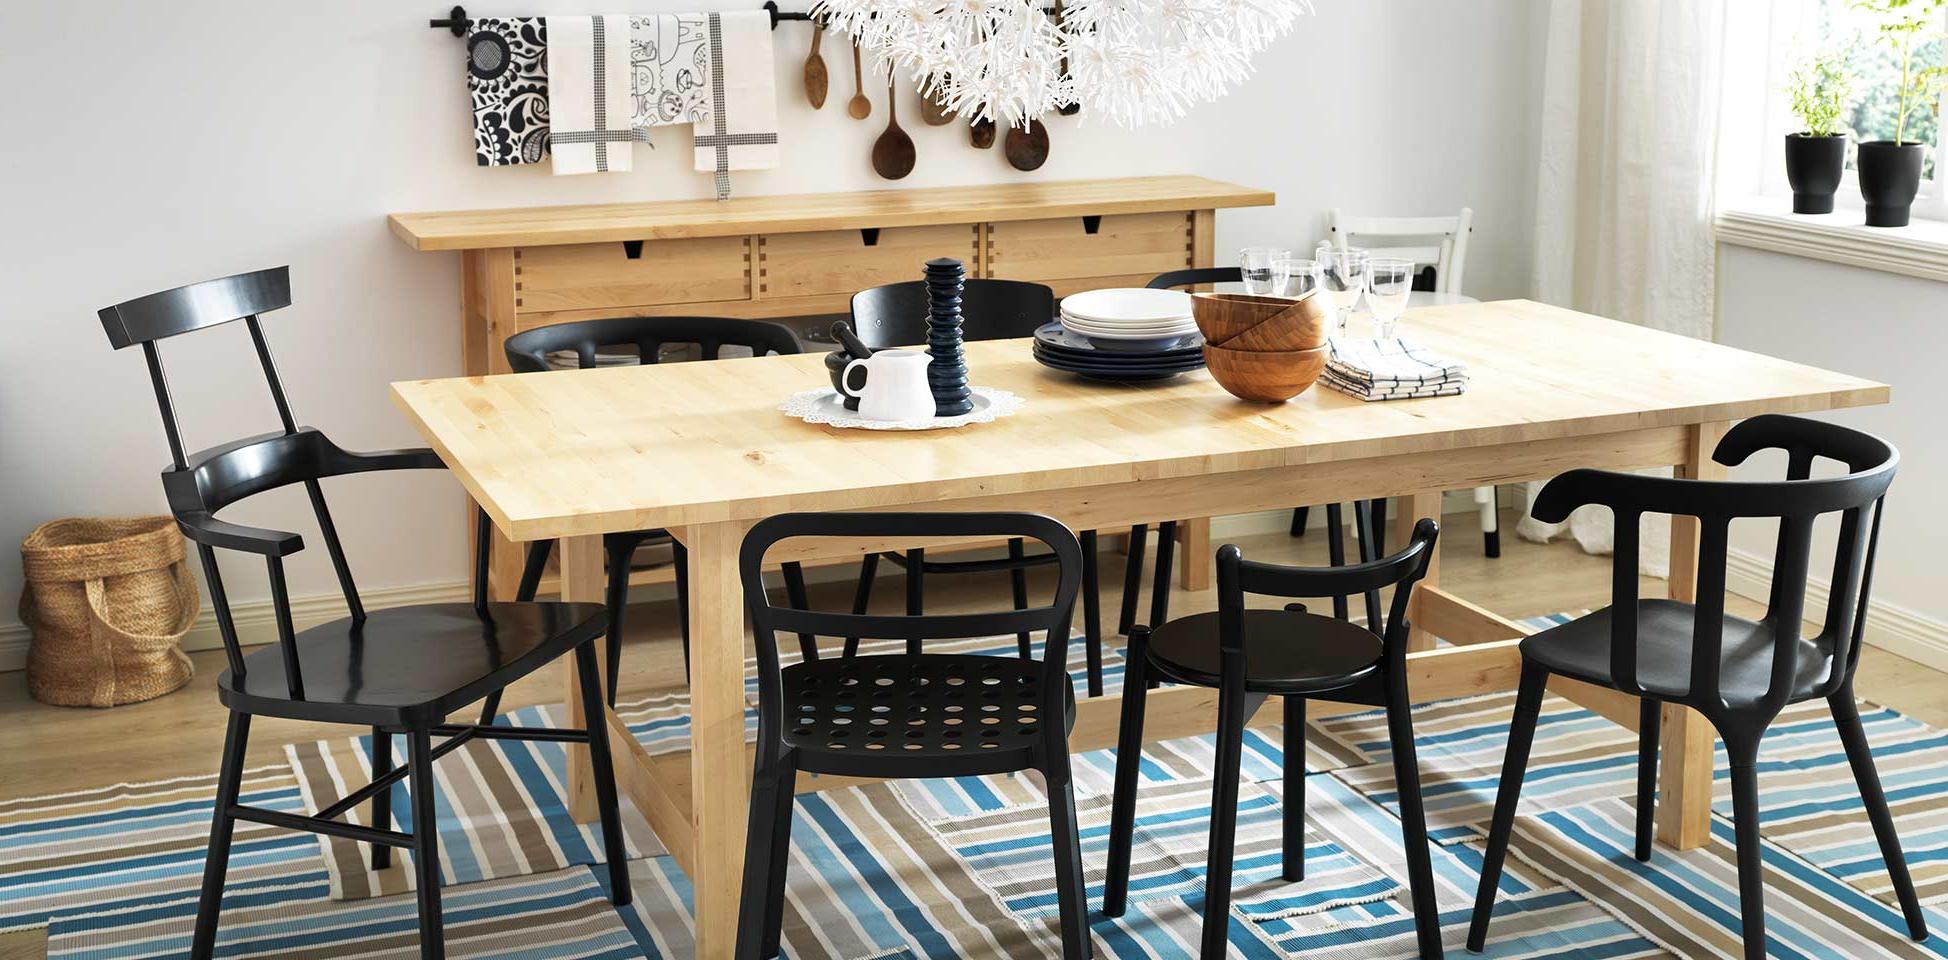 Mesas De Comedor Extensibles Ikea O2d5 Curso Aprende A Tener El Edor Siempre Listo Ikea